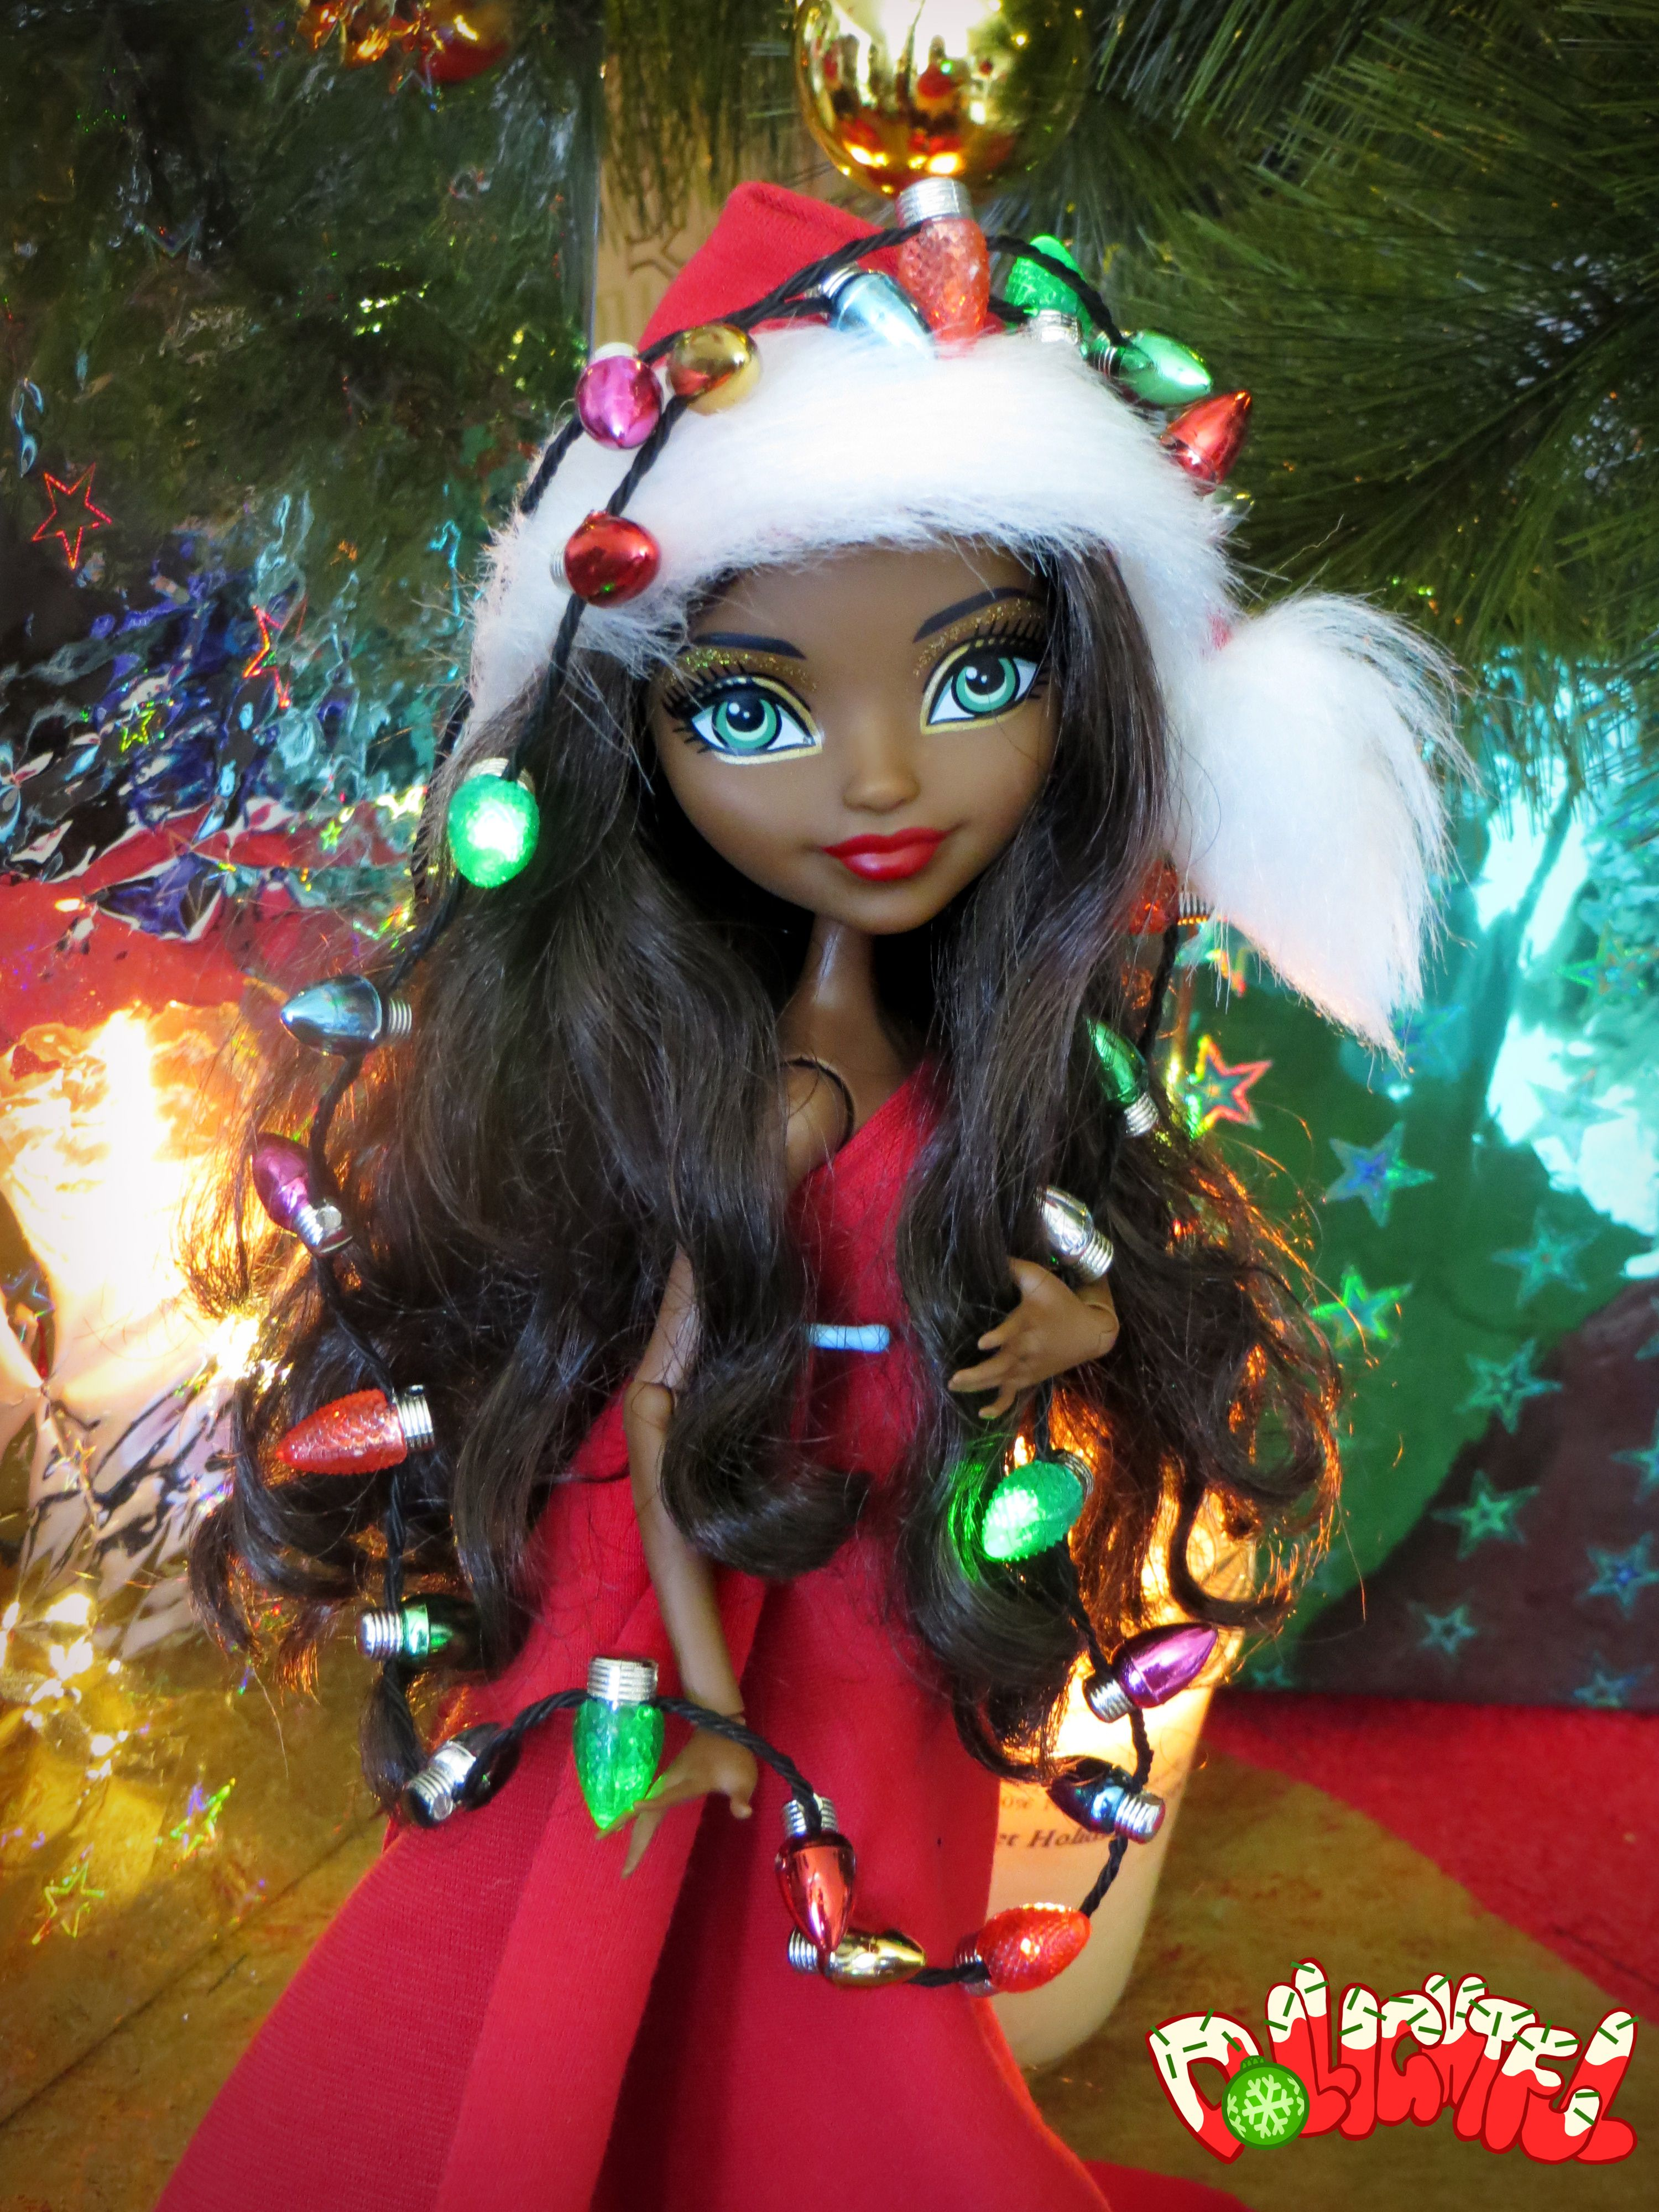 Merry Christmas! Santa hat DIY on youtube (easy and fun!) | OOAK ...